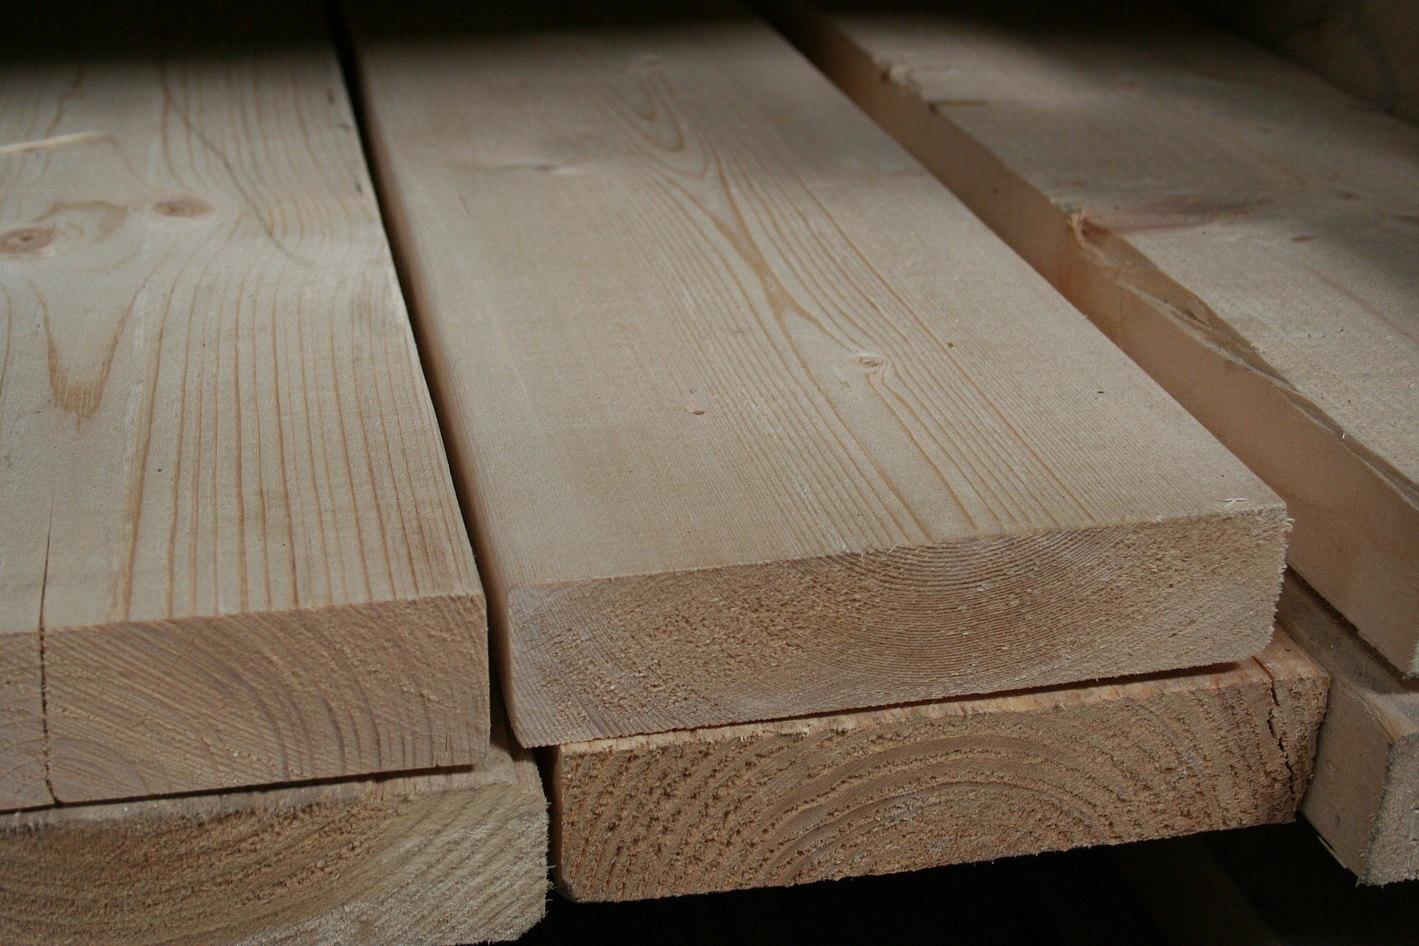 8x2 Rough Sawn Timber 44x195mm